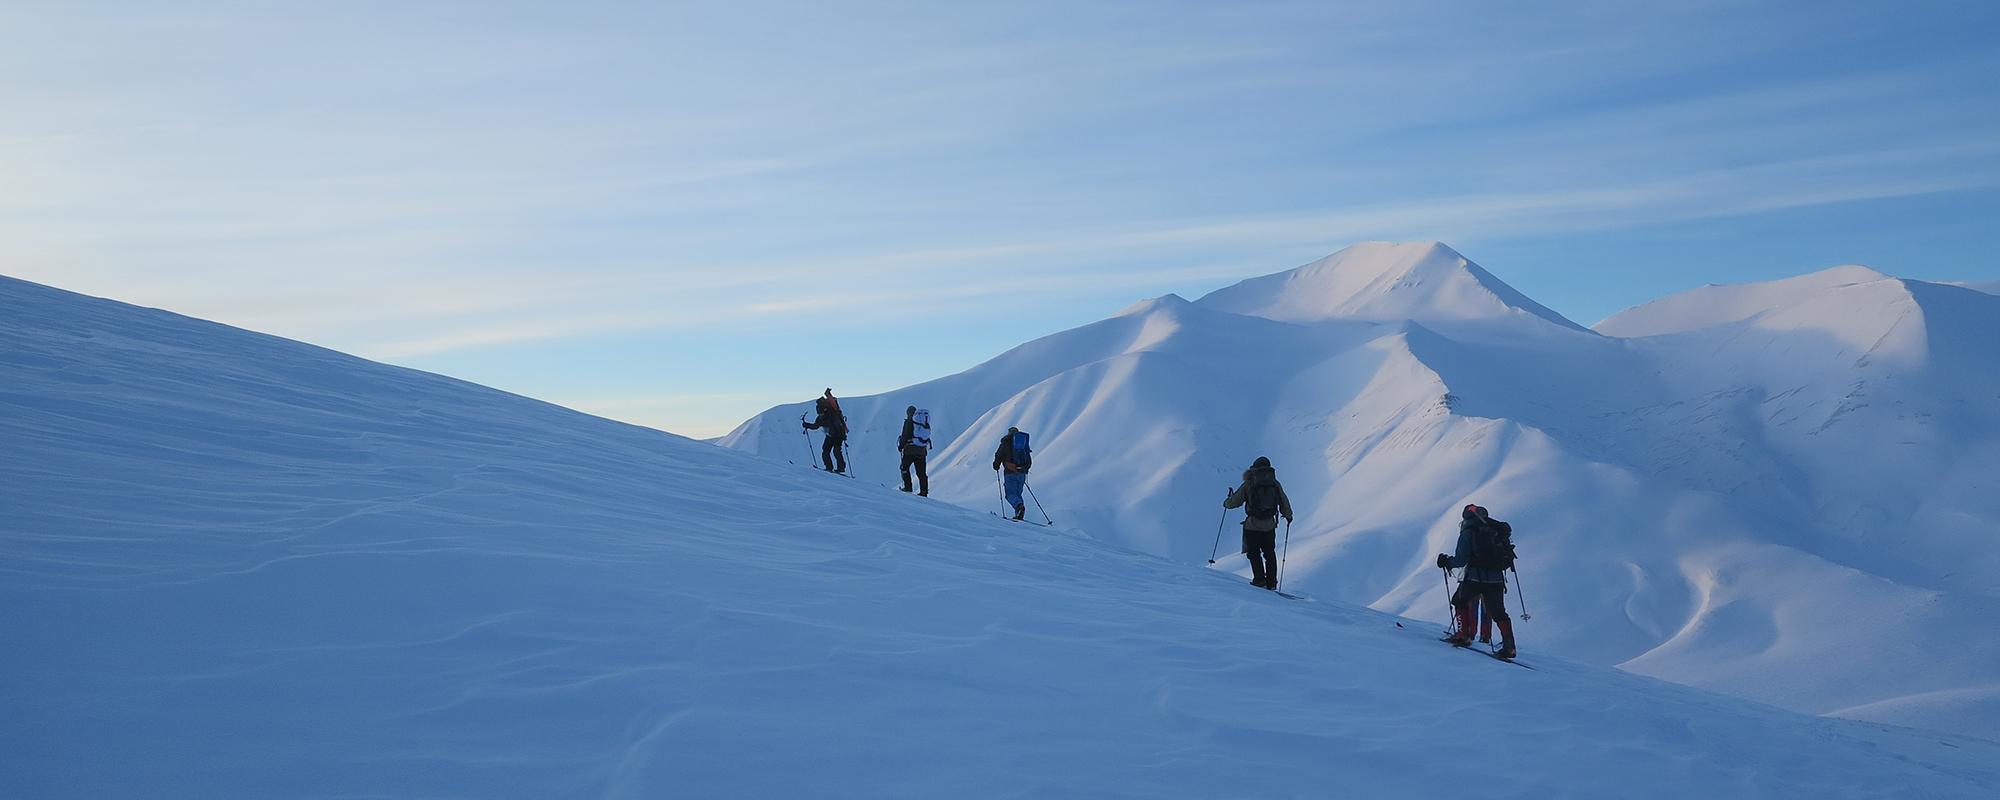 Skit fahren auf Svalbard